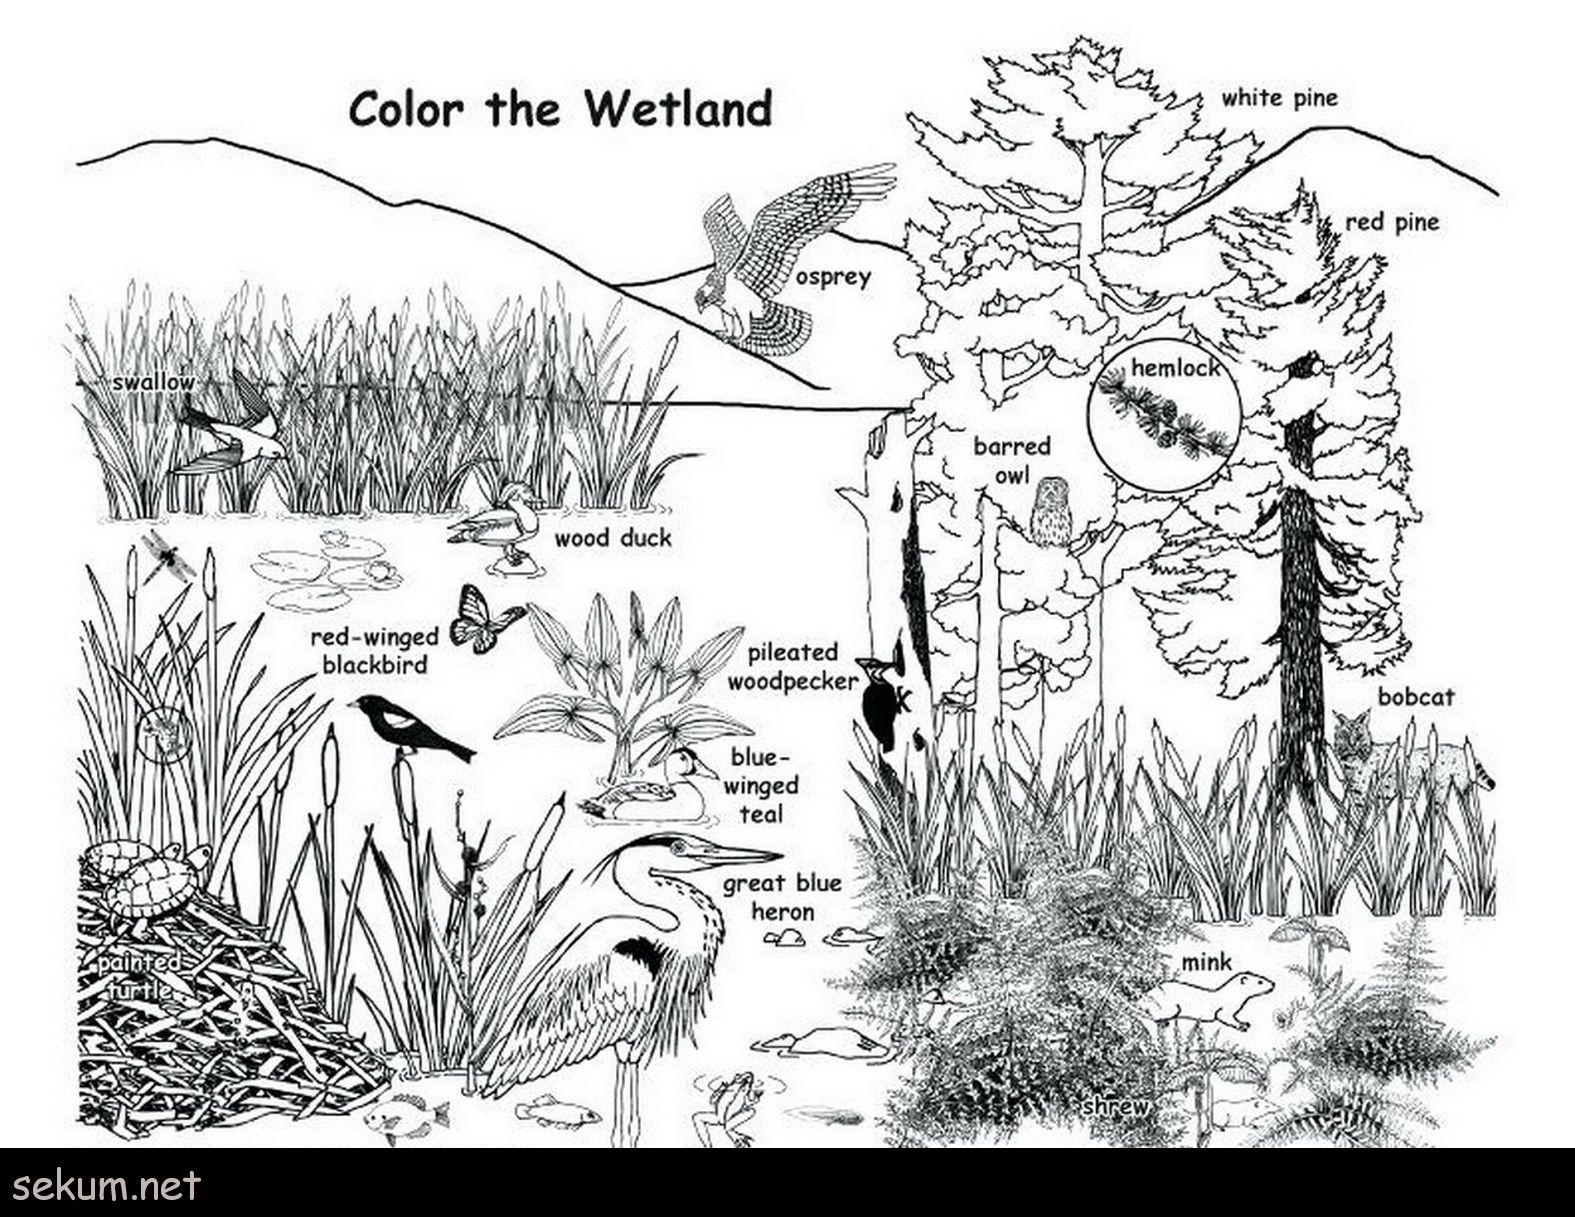 Wetland plants and animals coloring page Animal habitats